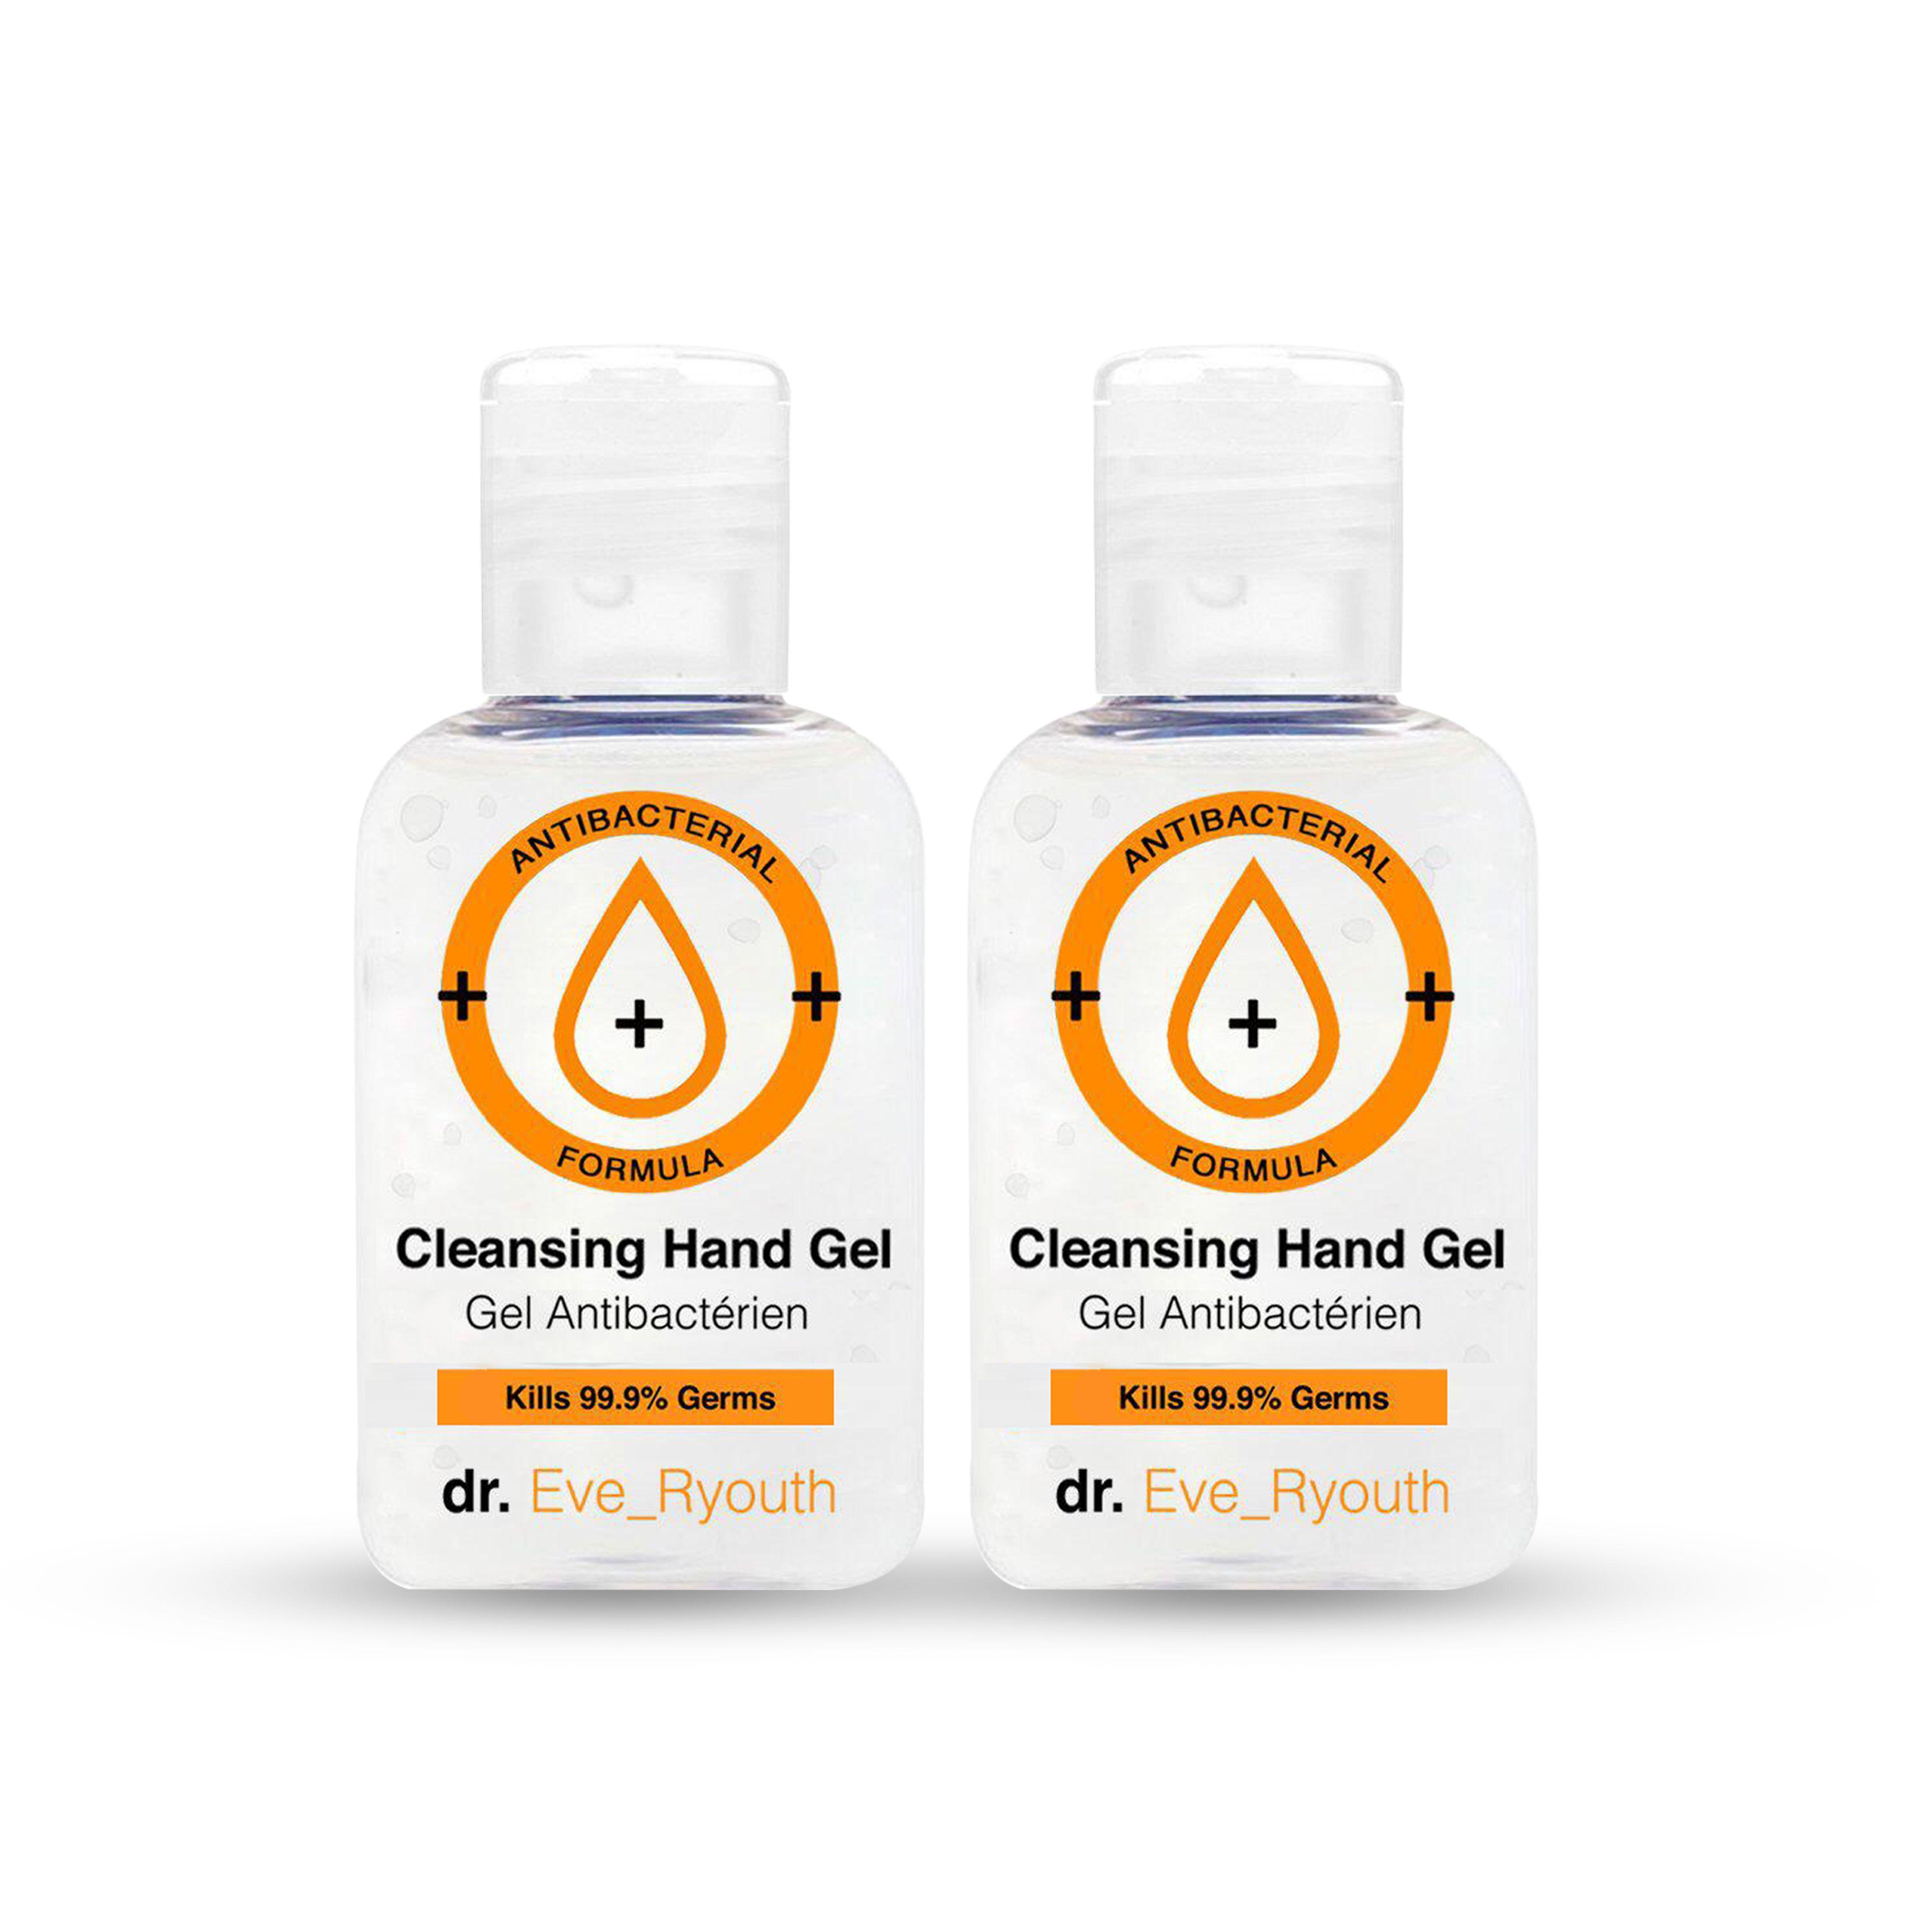 2 x Quick-Drying Anti-Bacterial Hand Gel Sanitizer 50ml